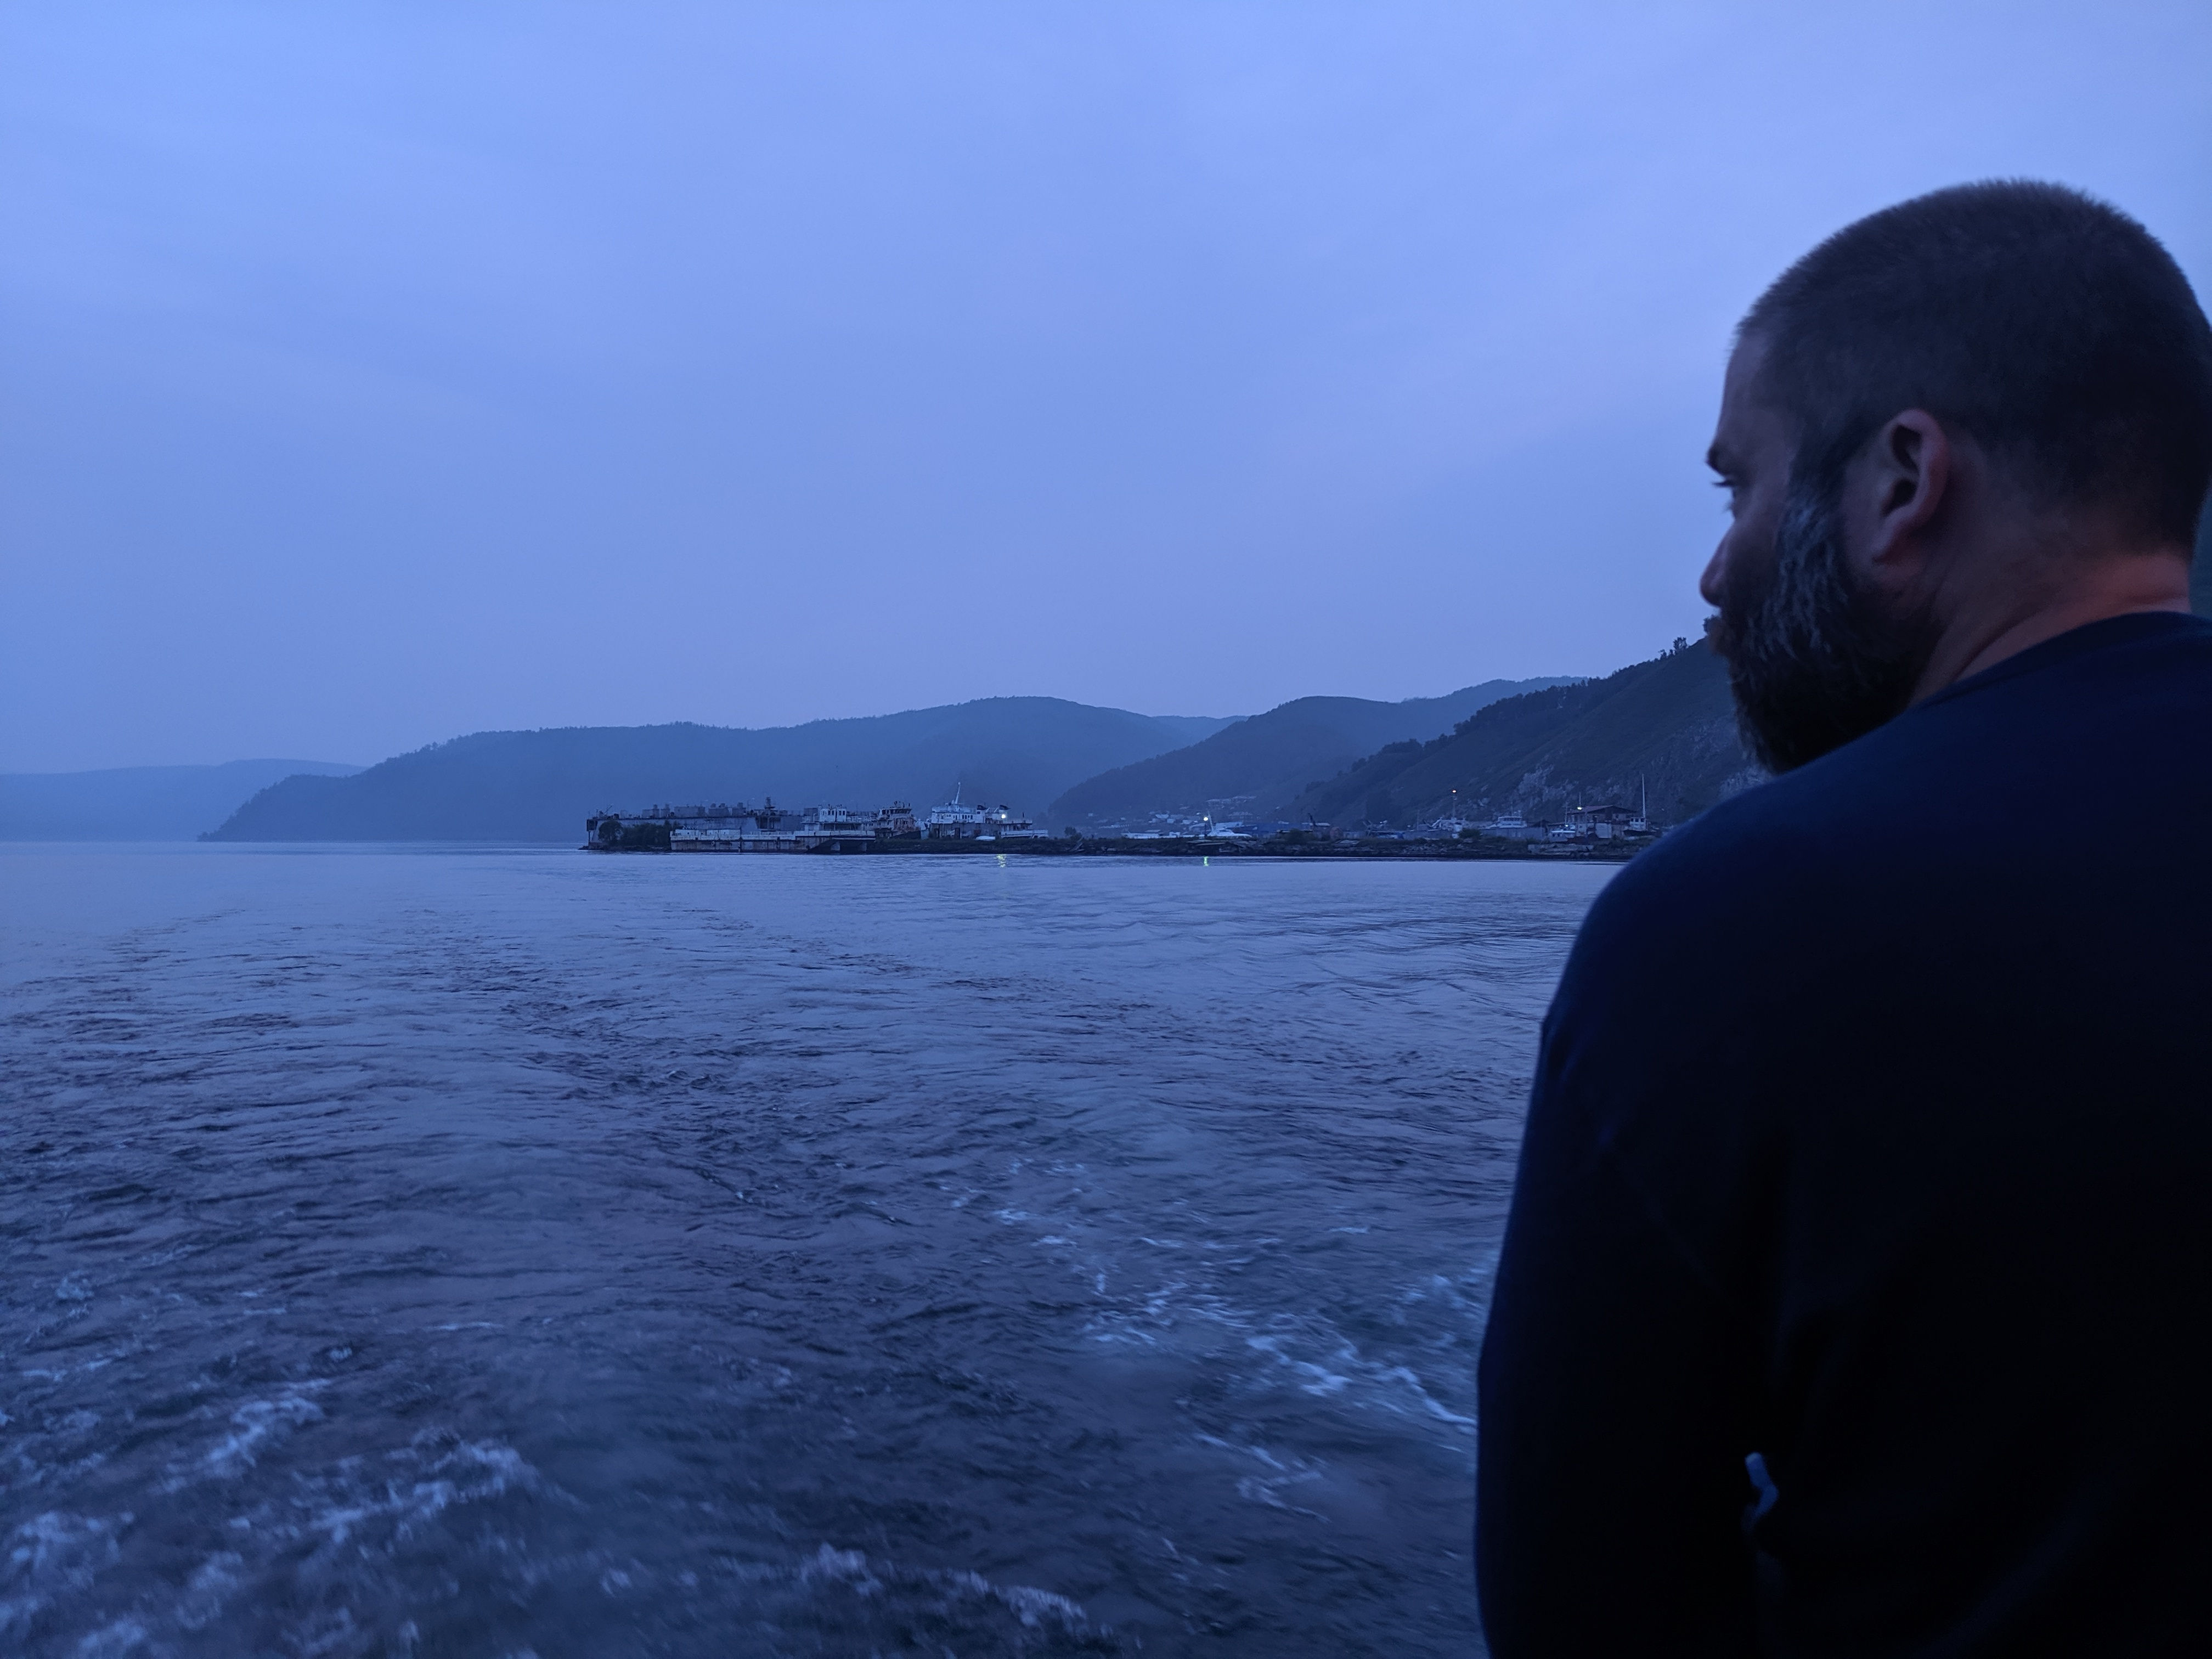 Jan riding the ferry across the Angara River near Listvyanka, Russia